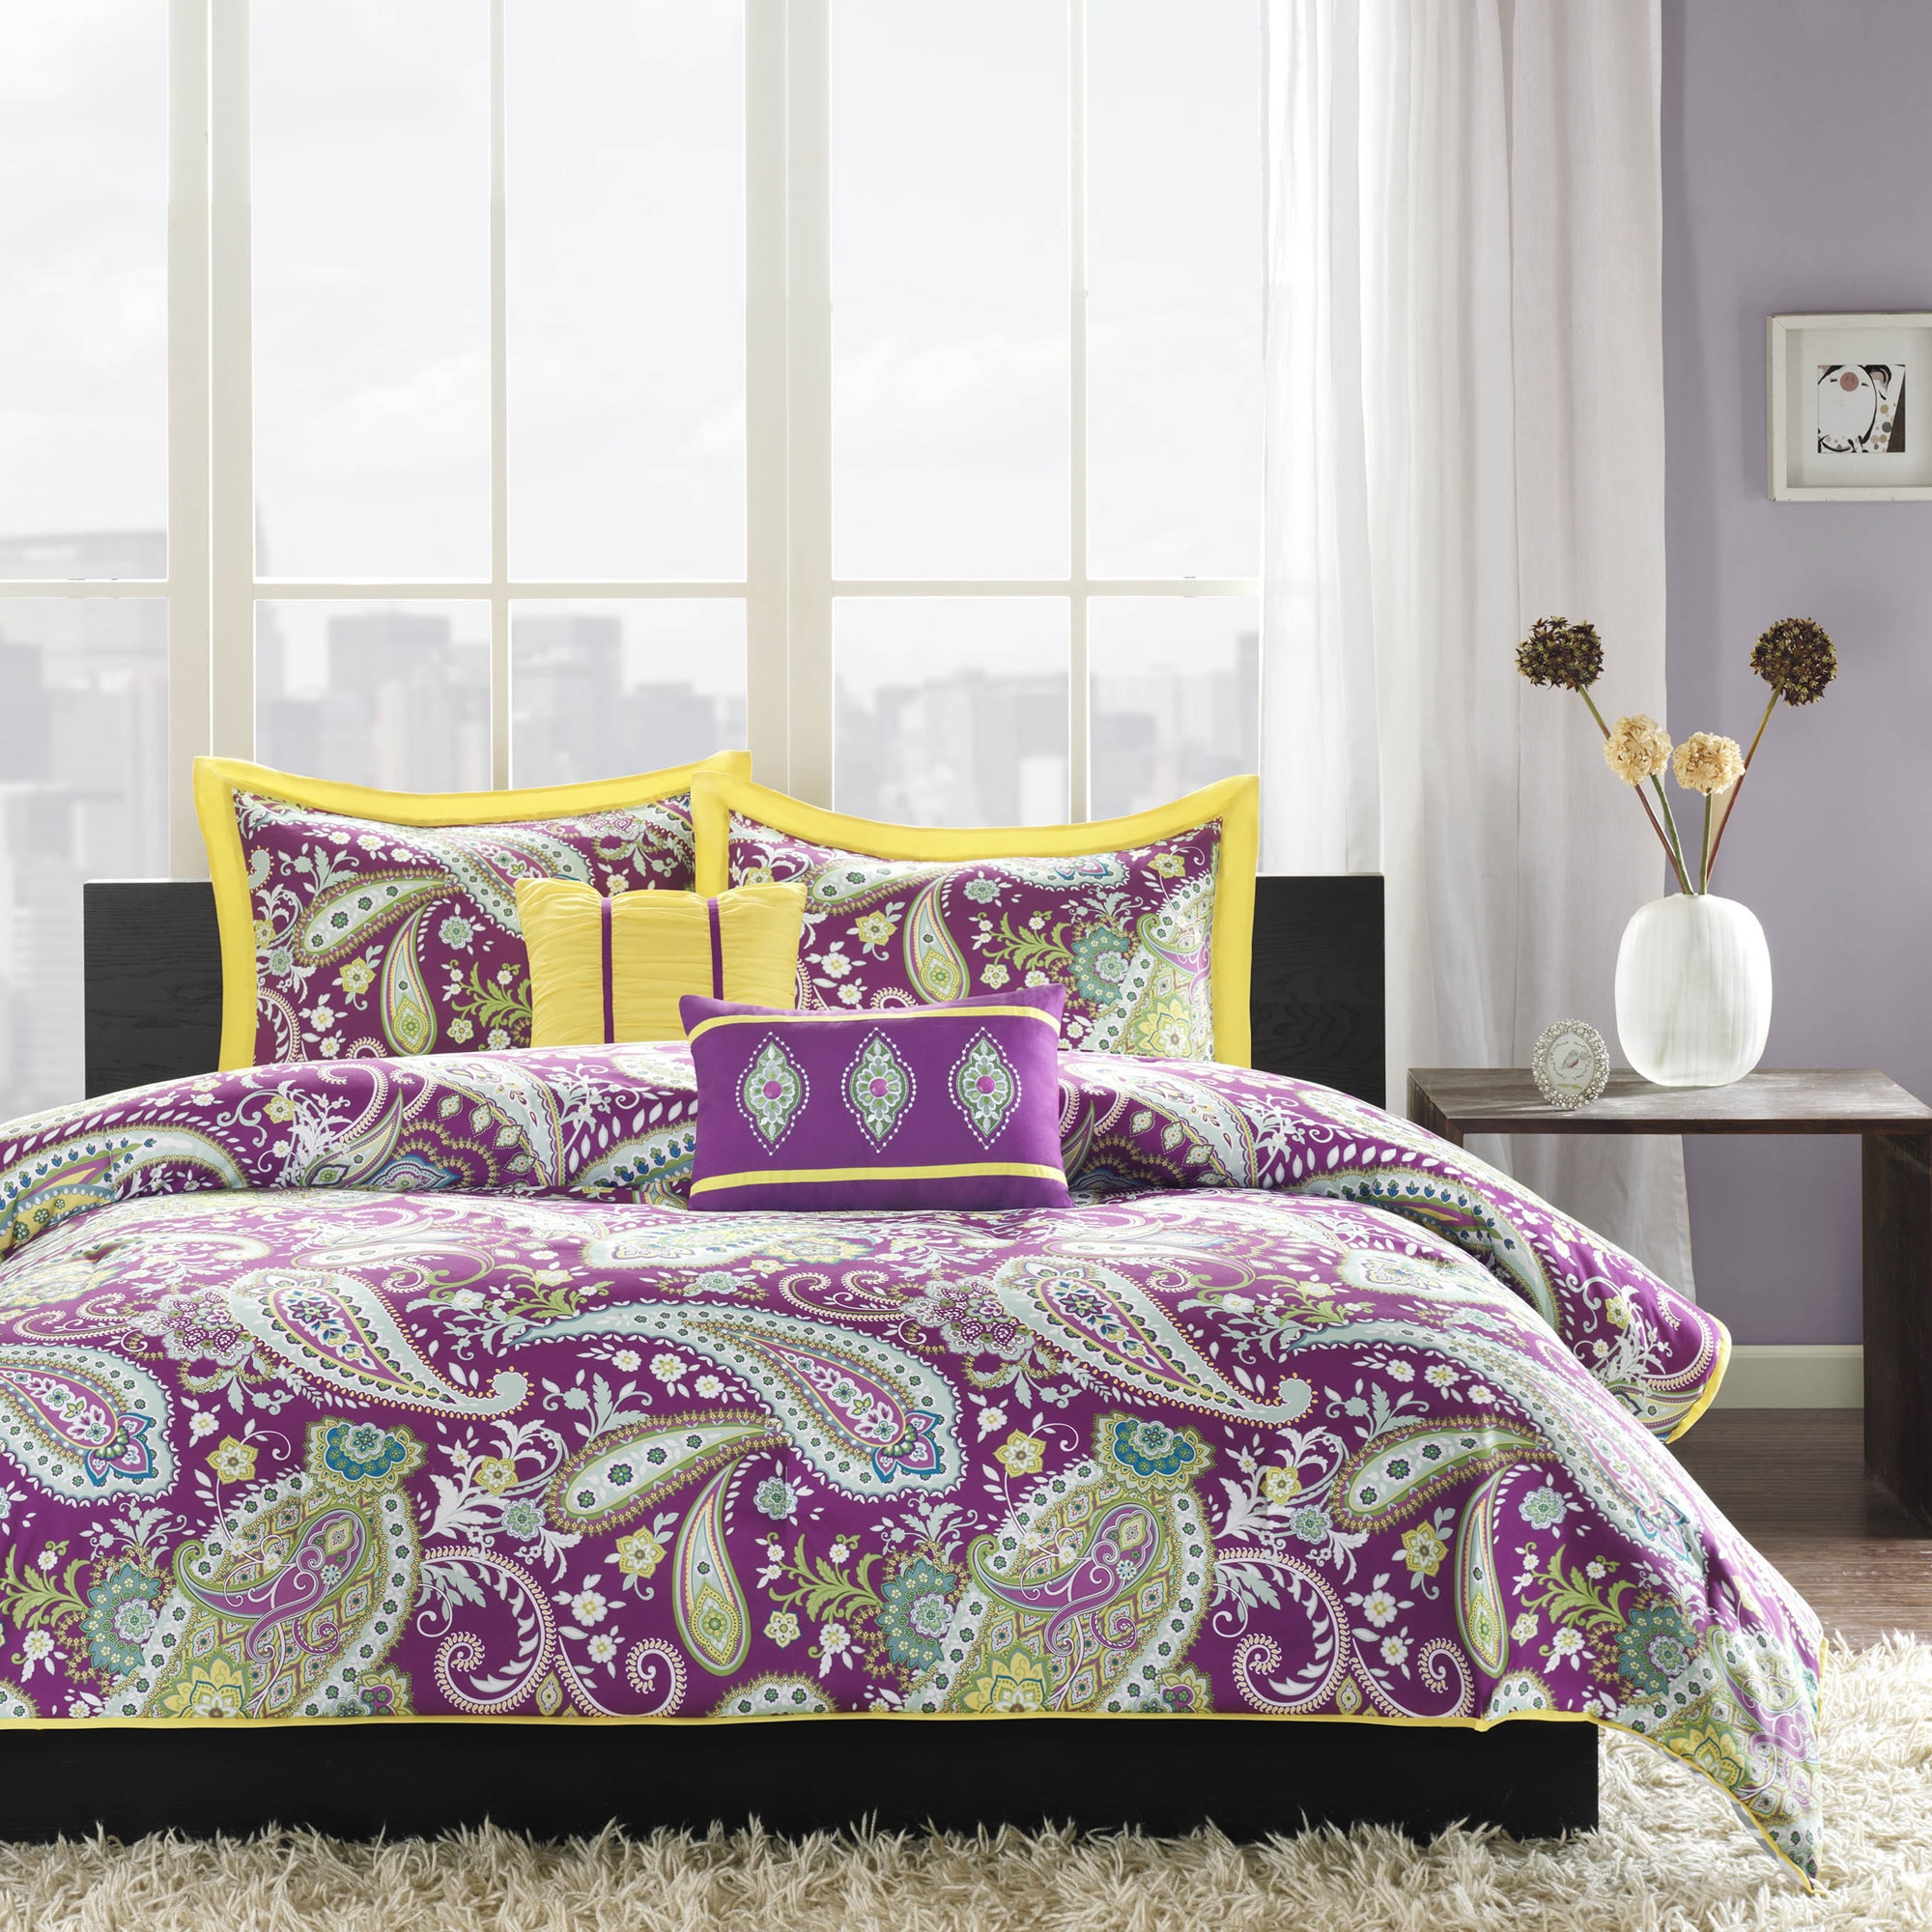 Shop Intelligent Design Kayla 5 Piece Duvet Cover Set